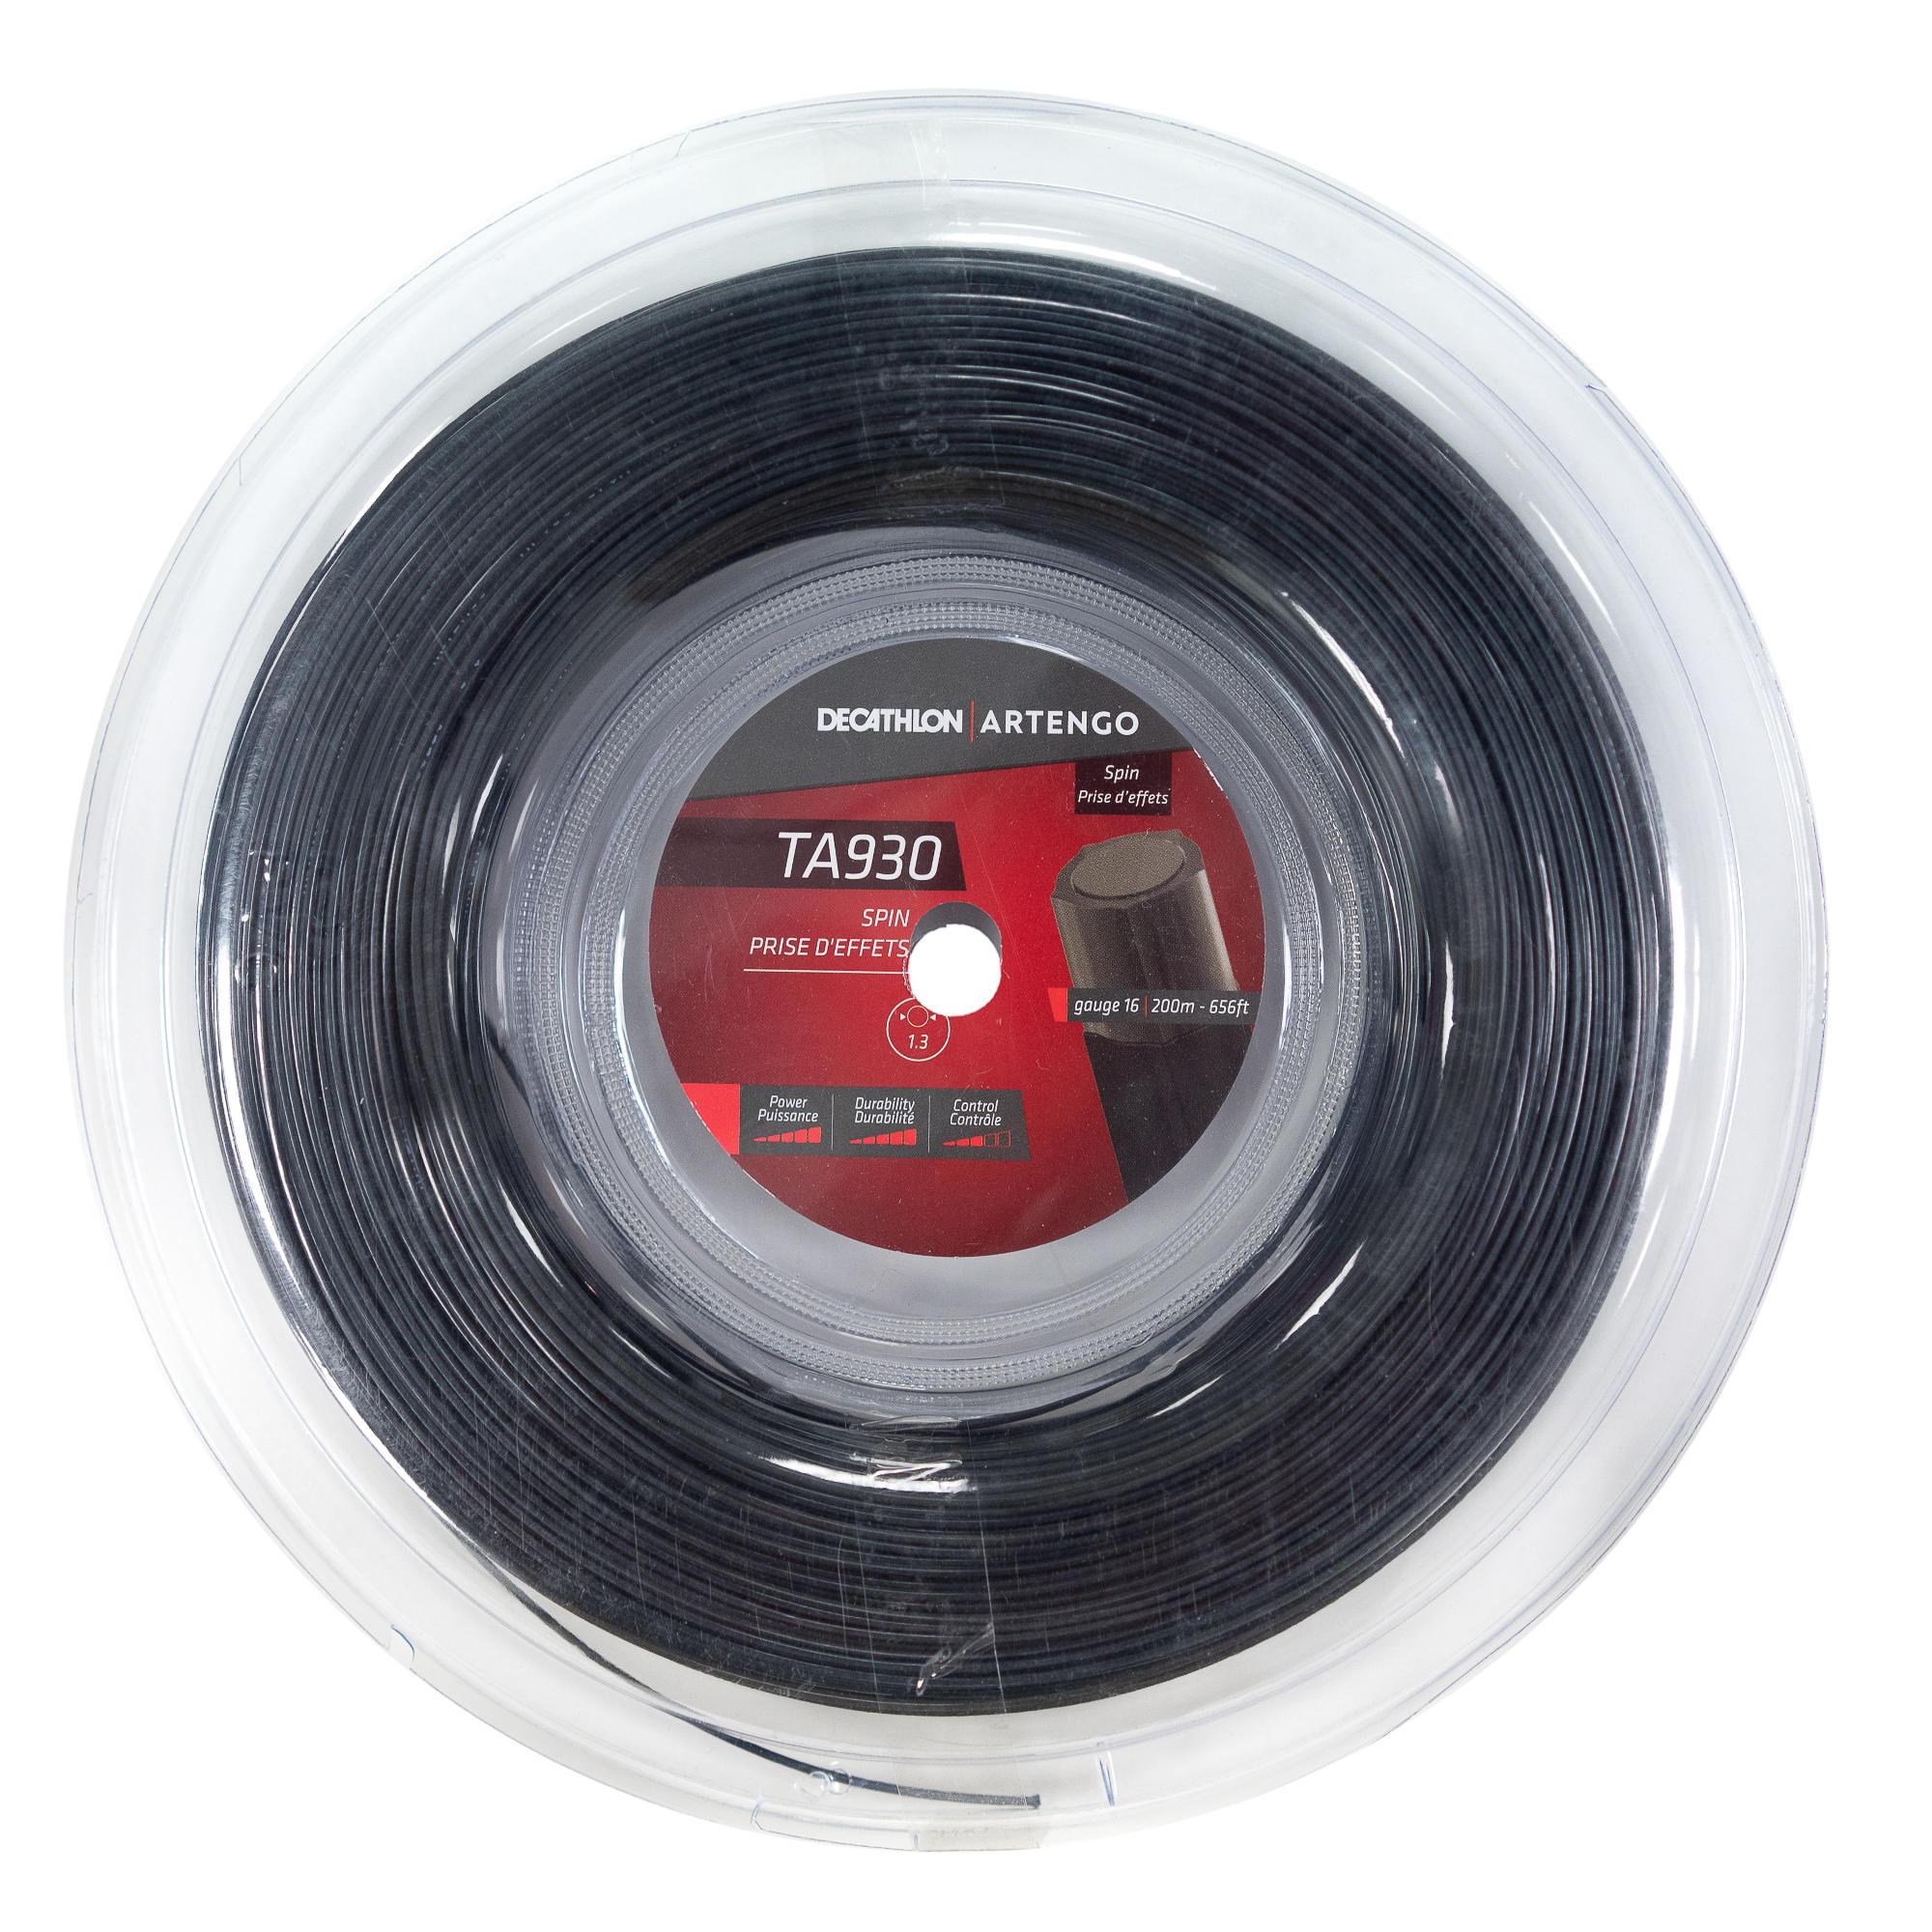 Cordaj TA930 Roll Spin 1,3 mm la Reducere poza